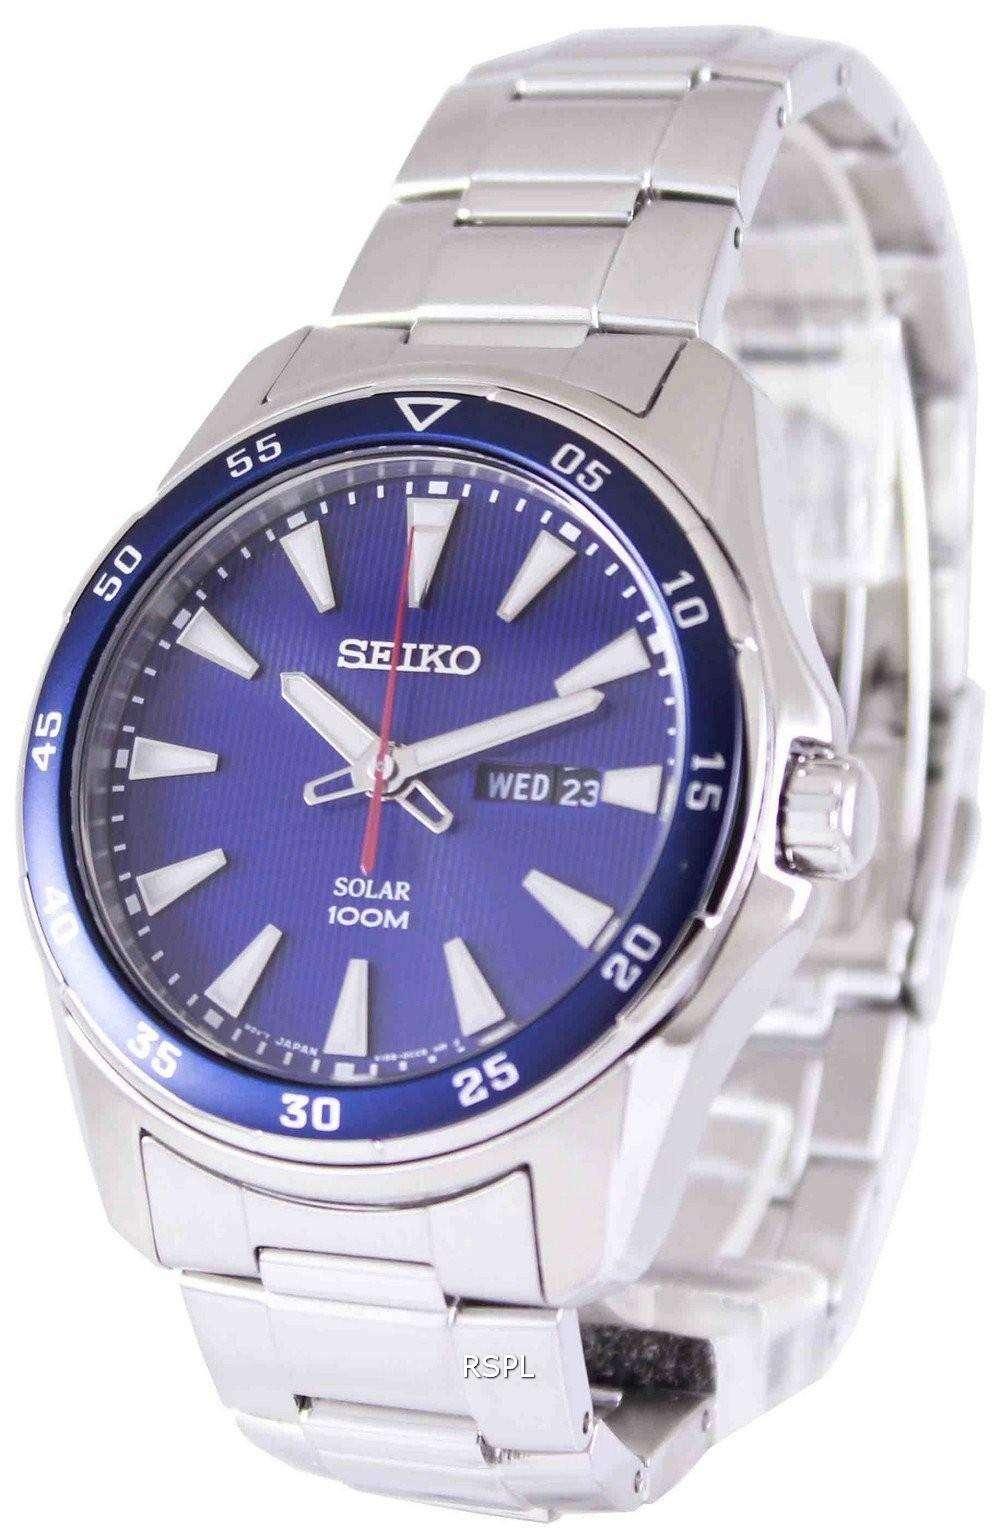 Seiko Solar 100m Sne391p1 Sne391p Mens Watch